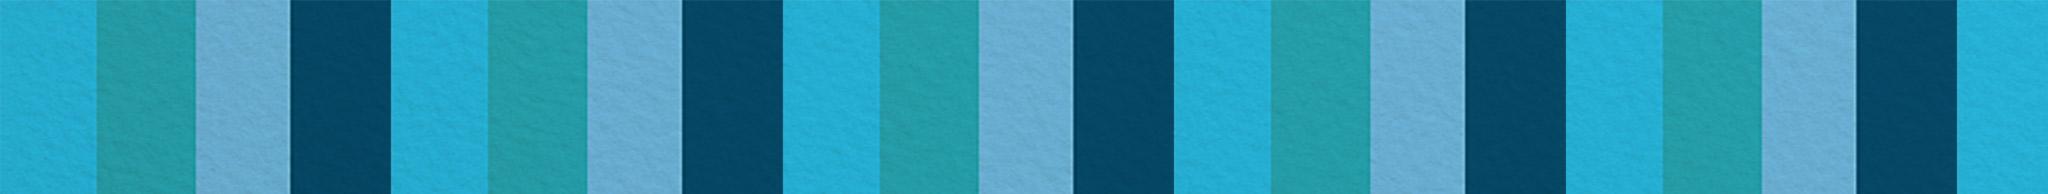 STRIPES_texture.jpg